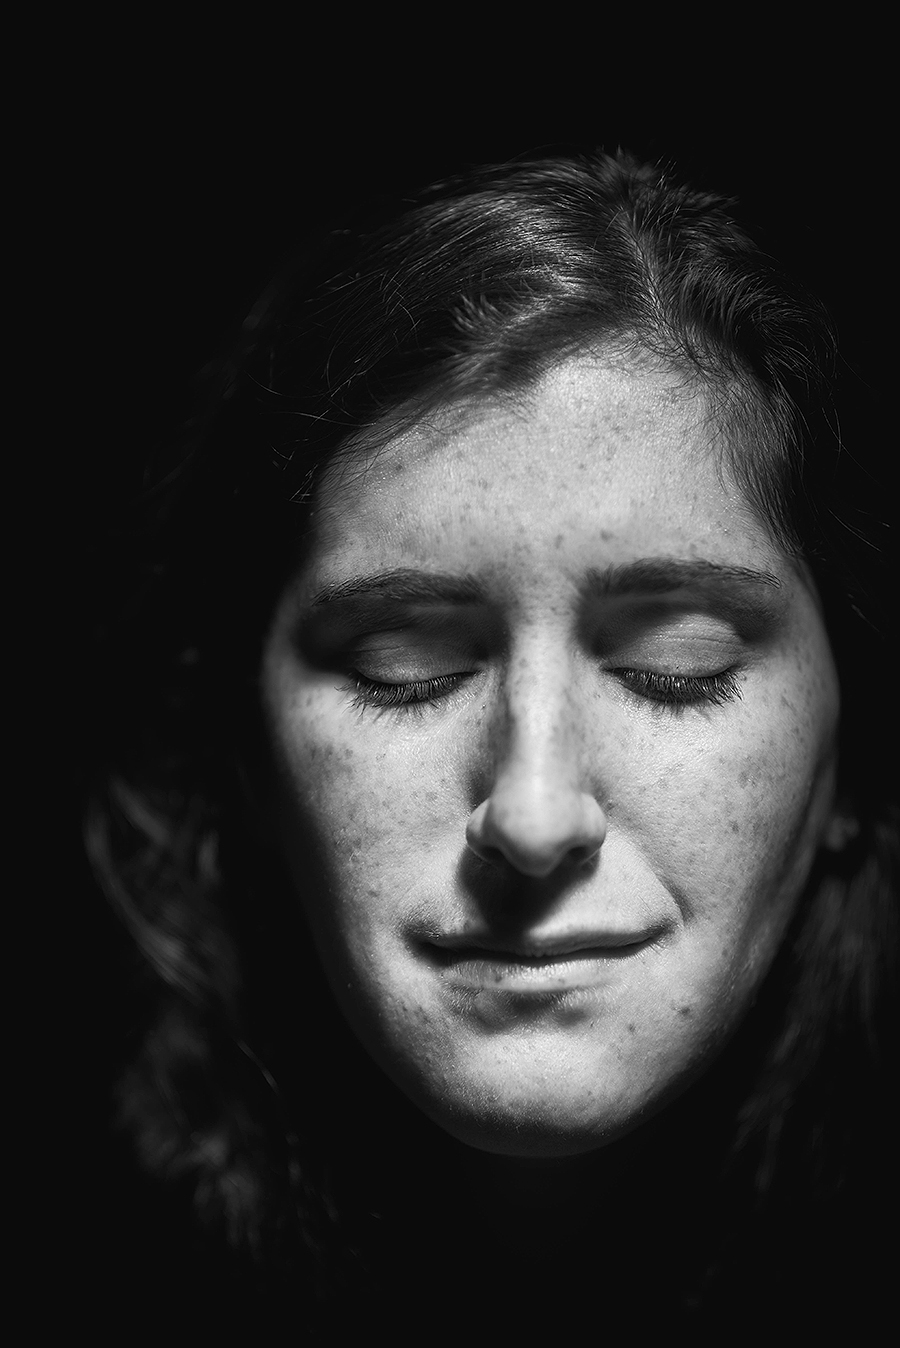 Abbie_sadness_photography_model_photo_emotion_portrait_headshot_kaleb_germinaro